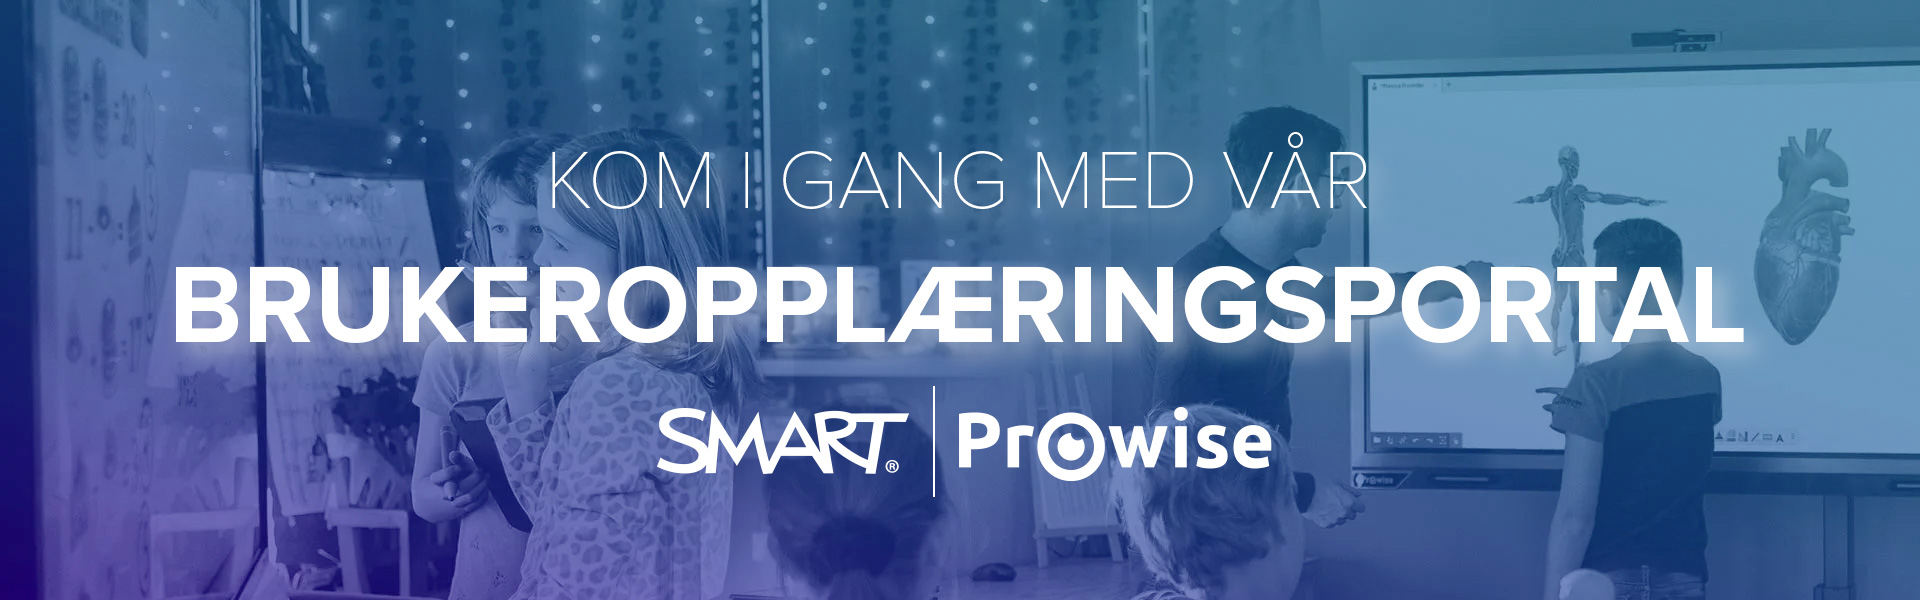 Kom_i_gang_med_brukeroppleaeringsportal